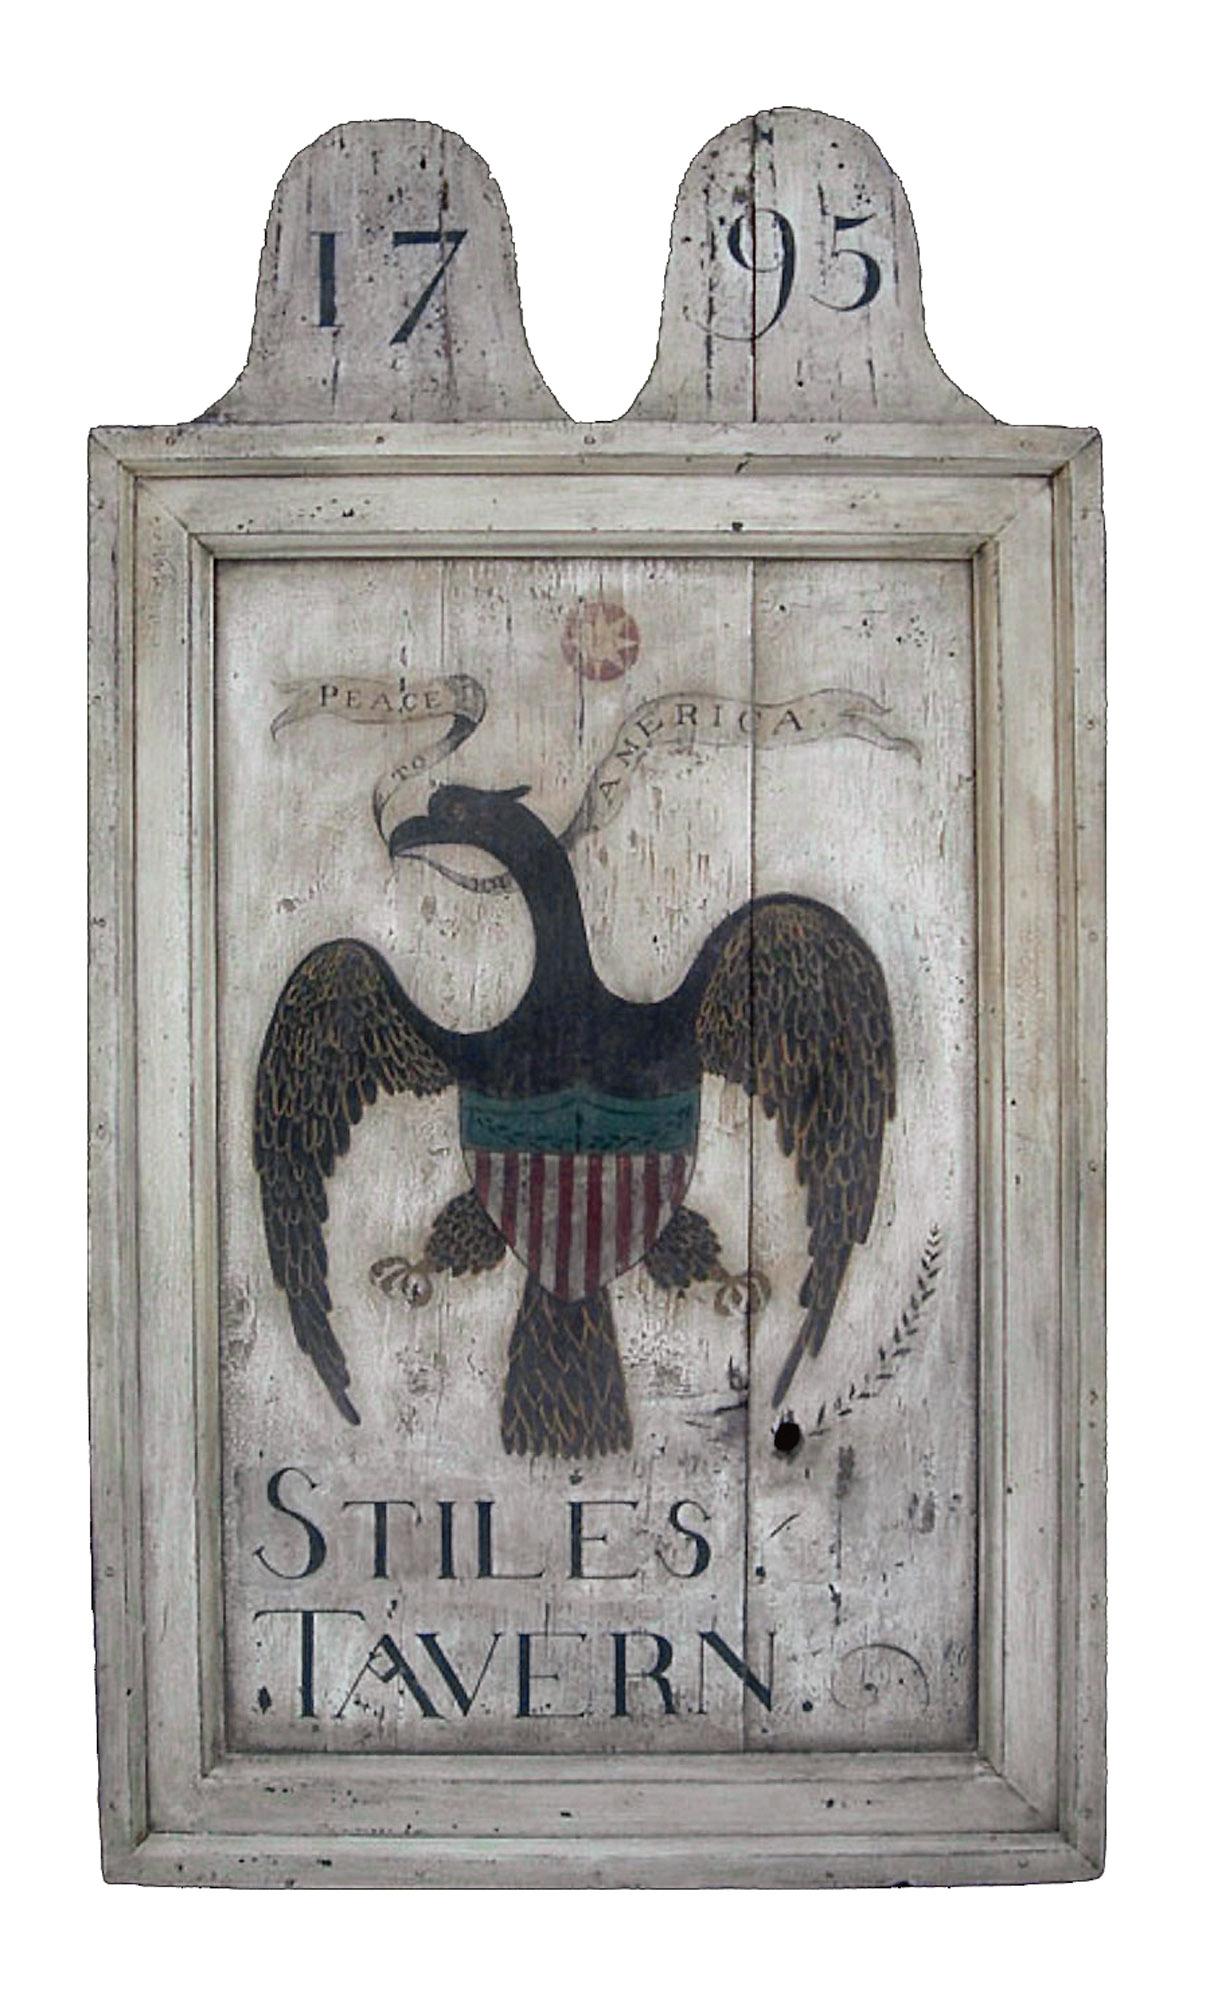 """Stiles Tavern"" sign"